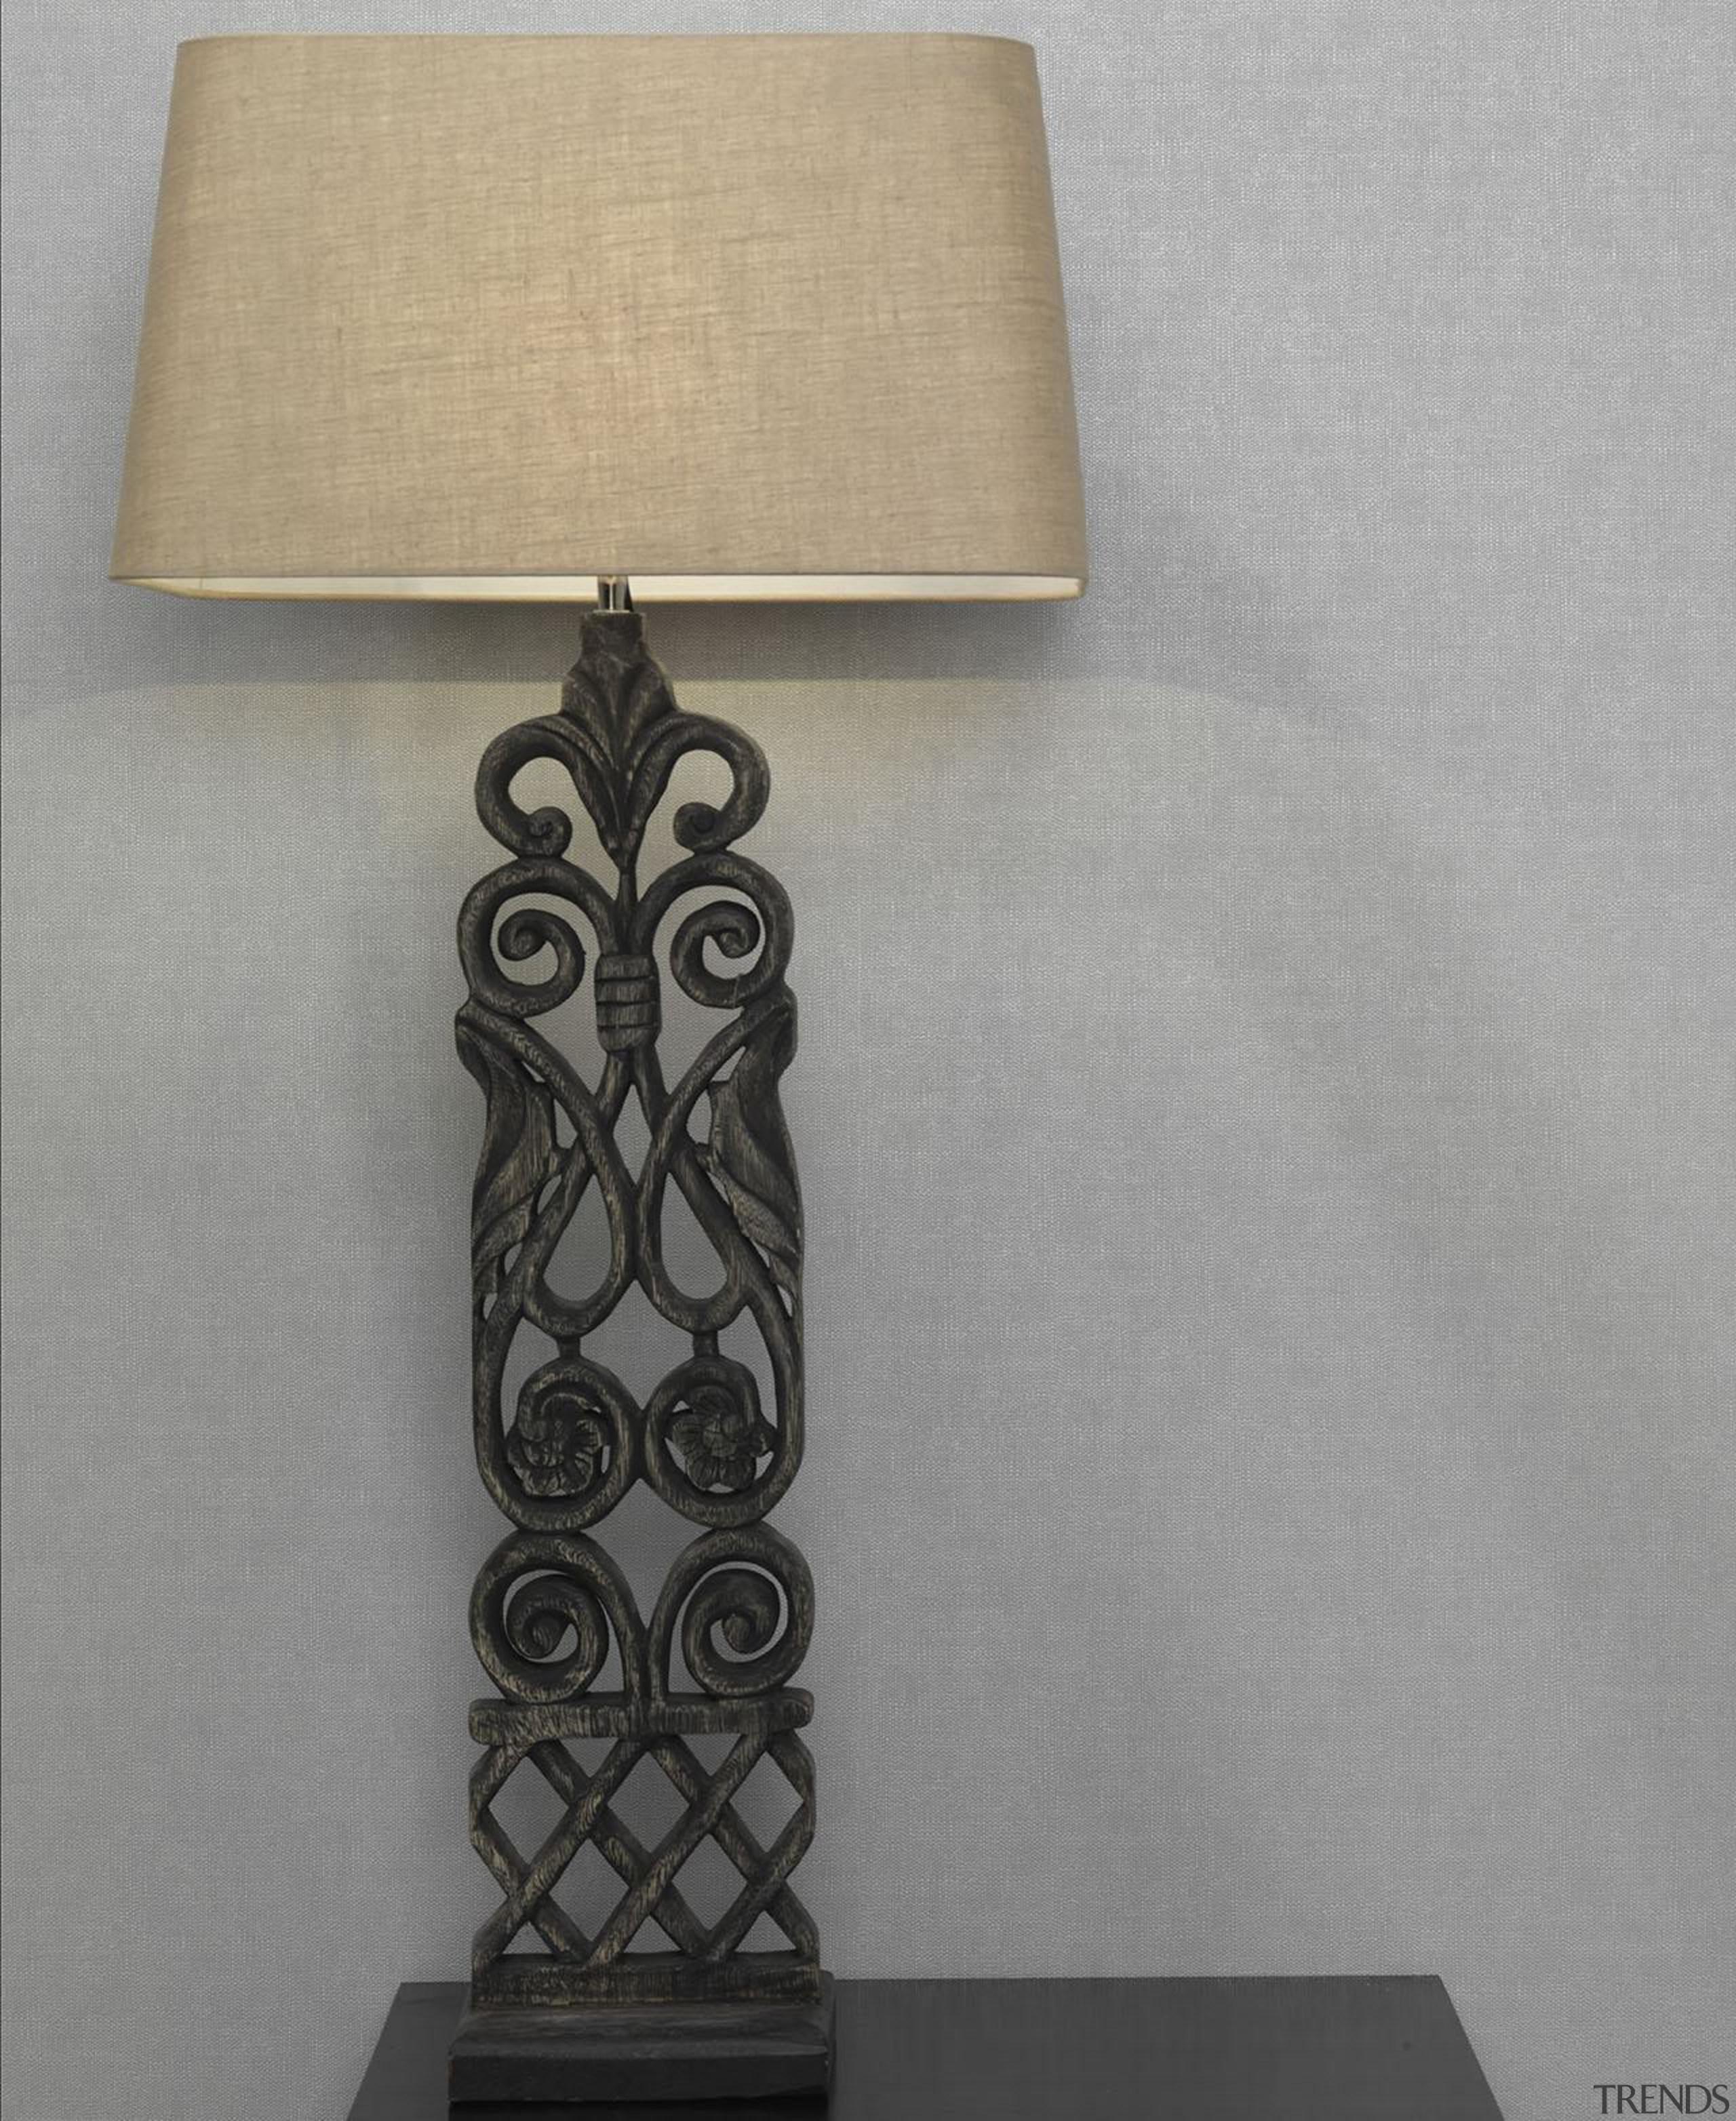 Modern Style Range - lamp | light fixture lamp, light fixture, lighting, product design, gray